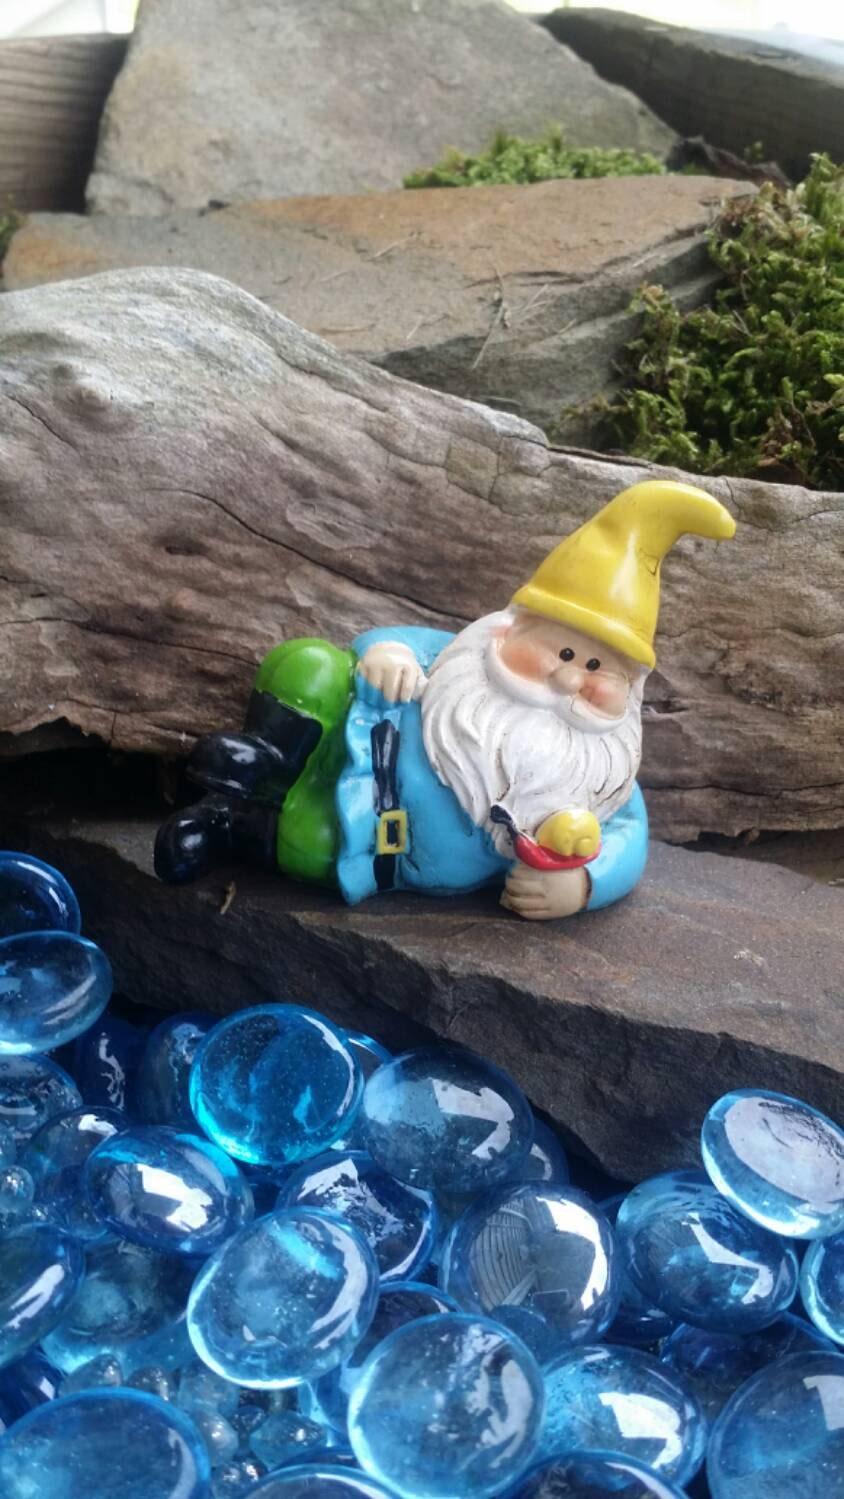 Miniature Garden Gnome Spring Gnome Gardening Gnomes Lying